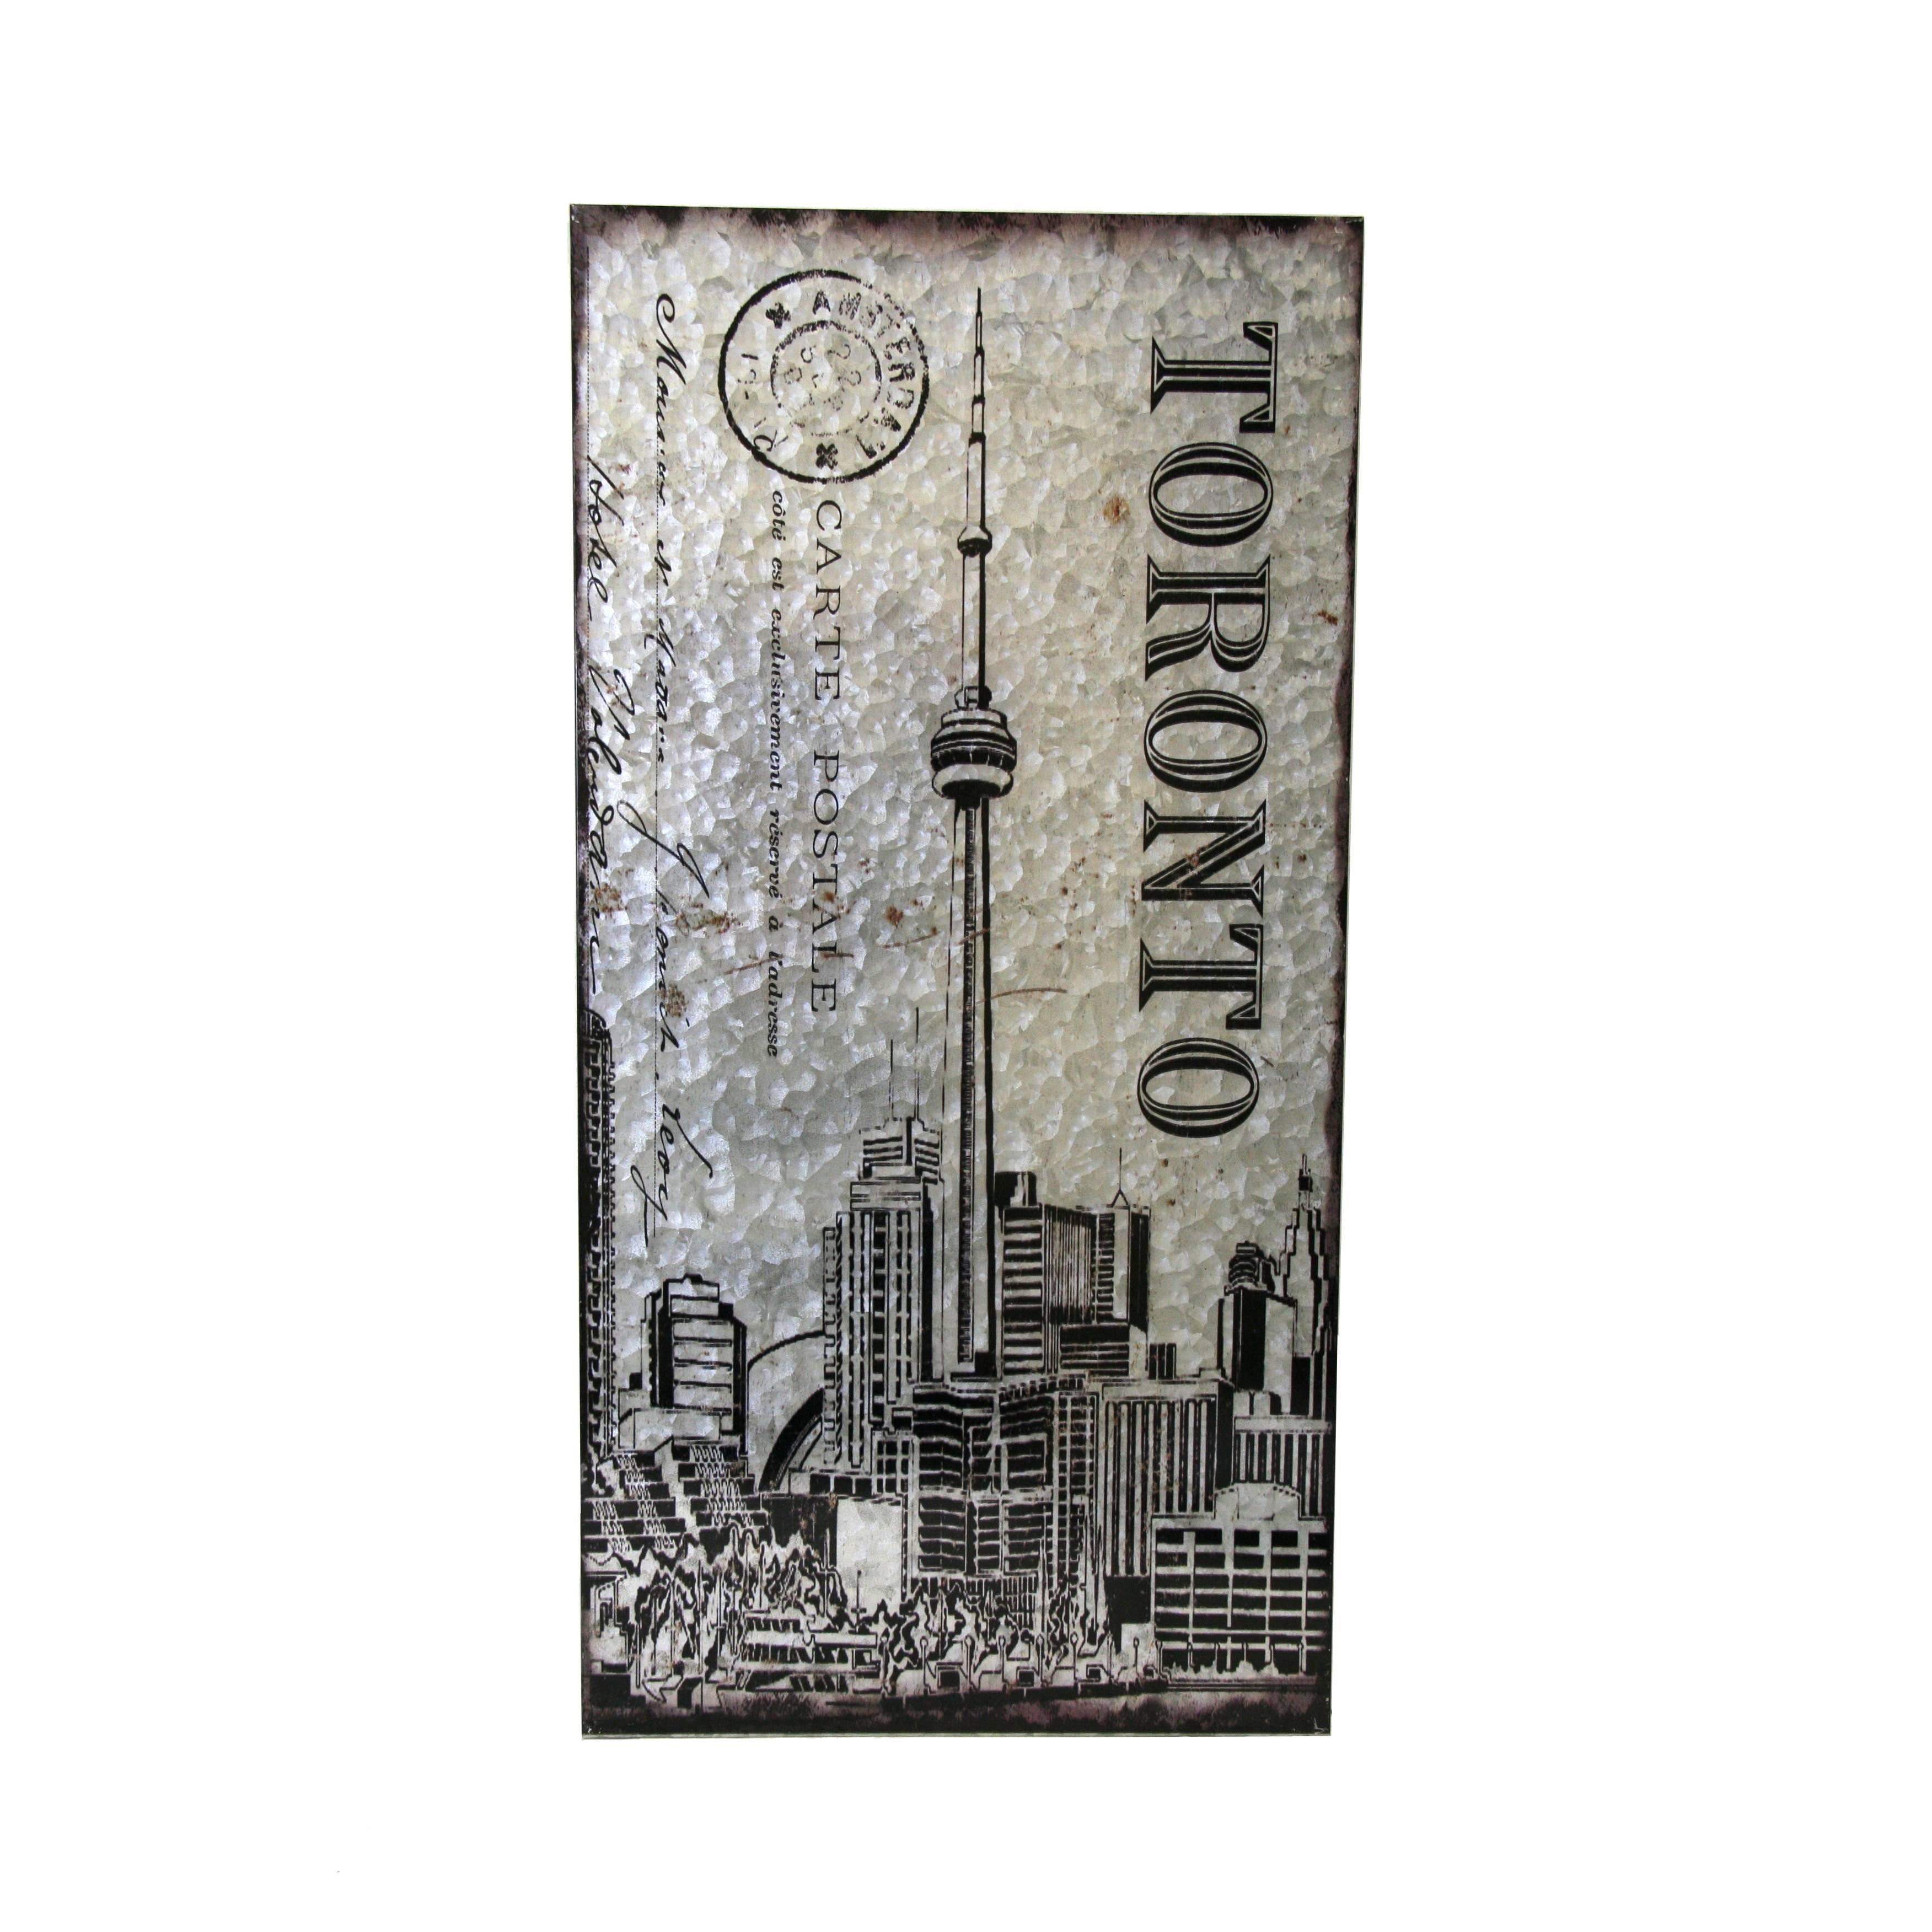 Metal Wall Art – Toronto Cn Tower   Boxman With Regard To Current Toronto Metal Wall Art (View 7 of 20)